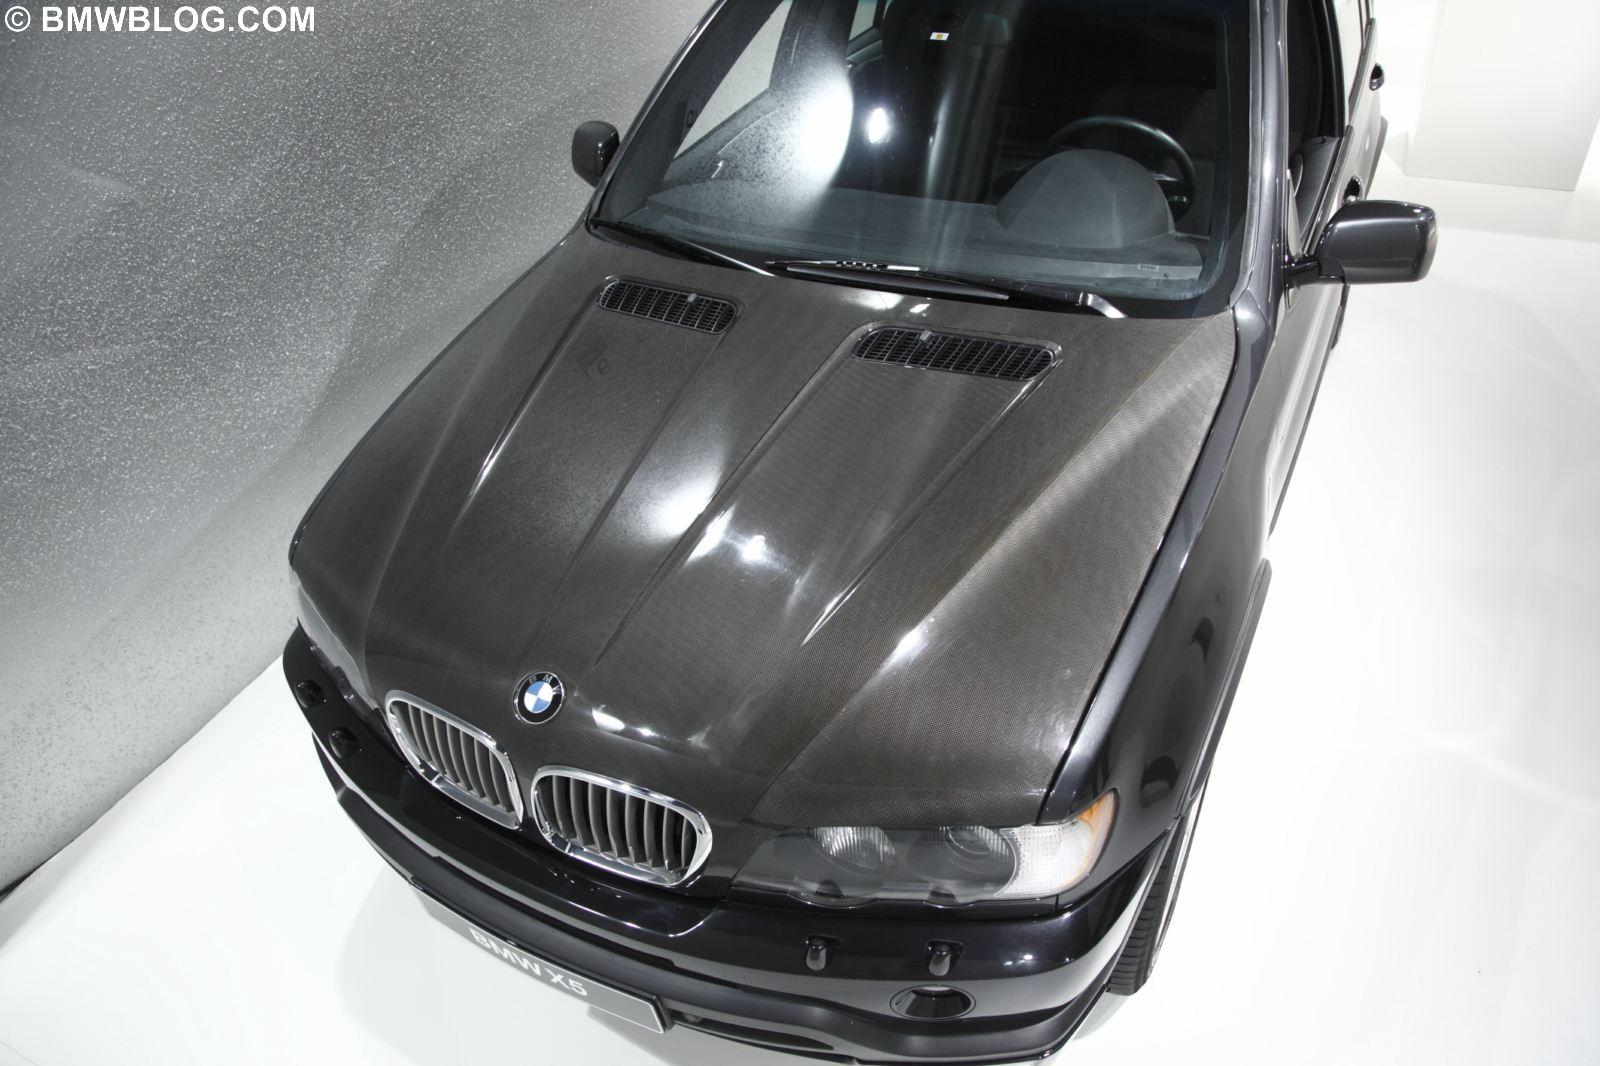 bmw x5 carbon fiber 211